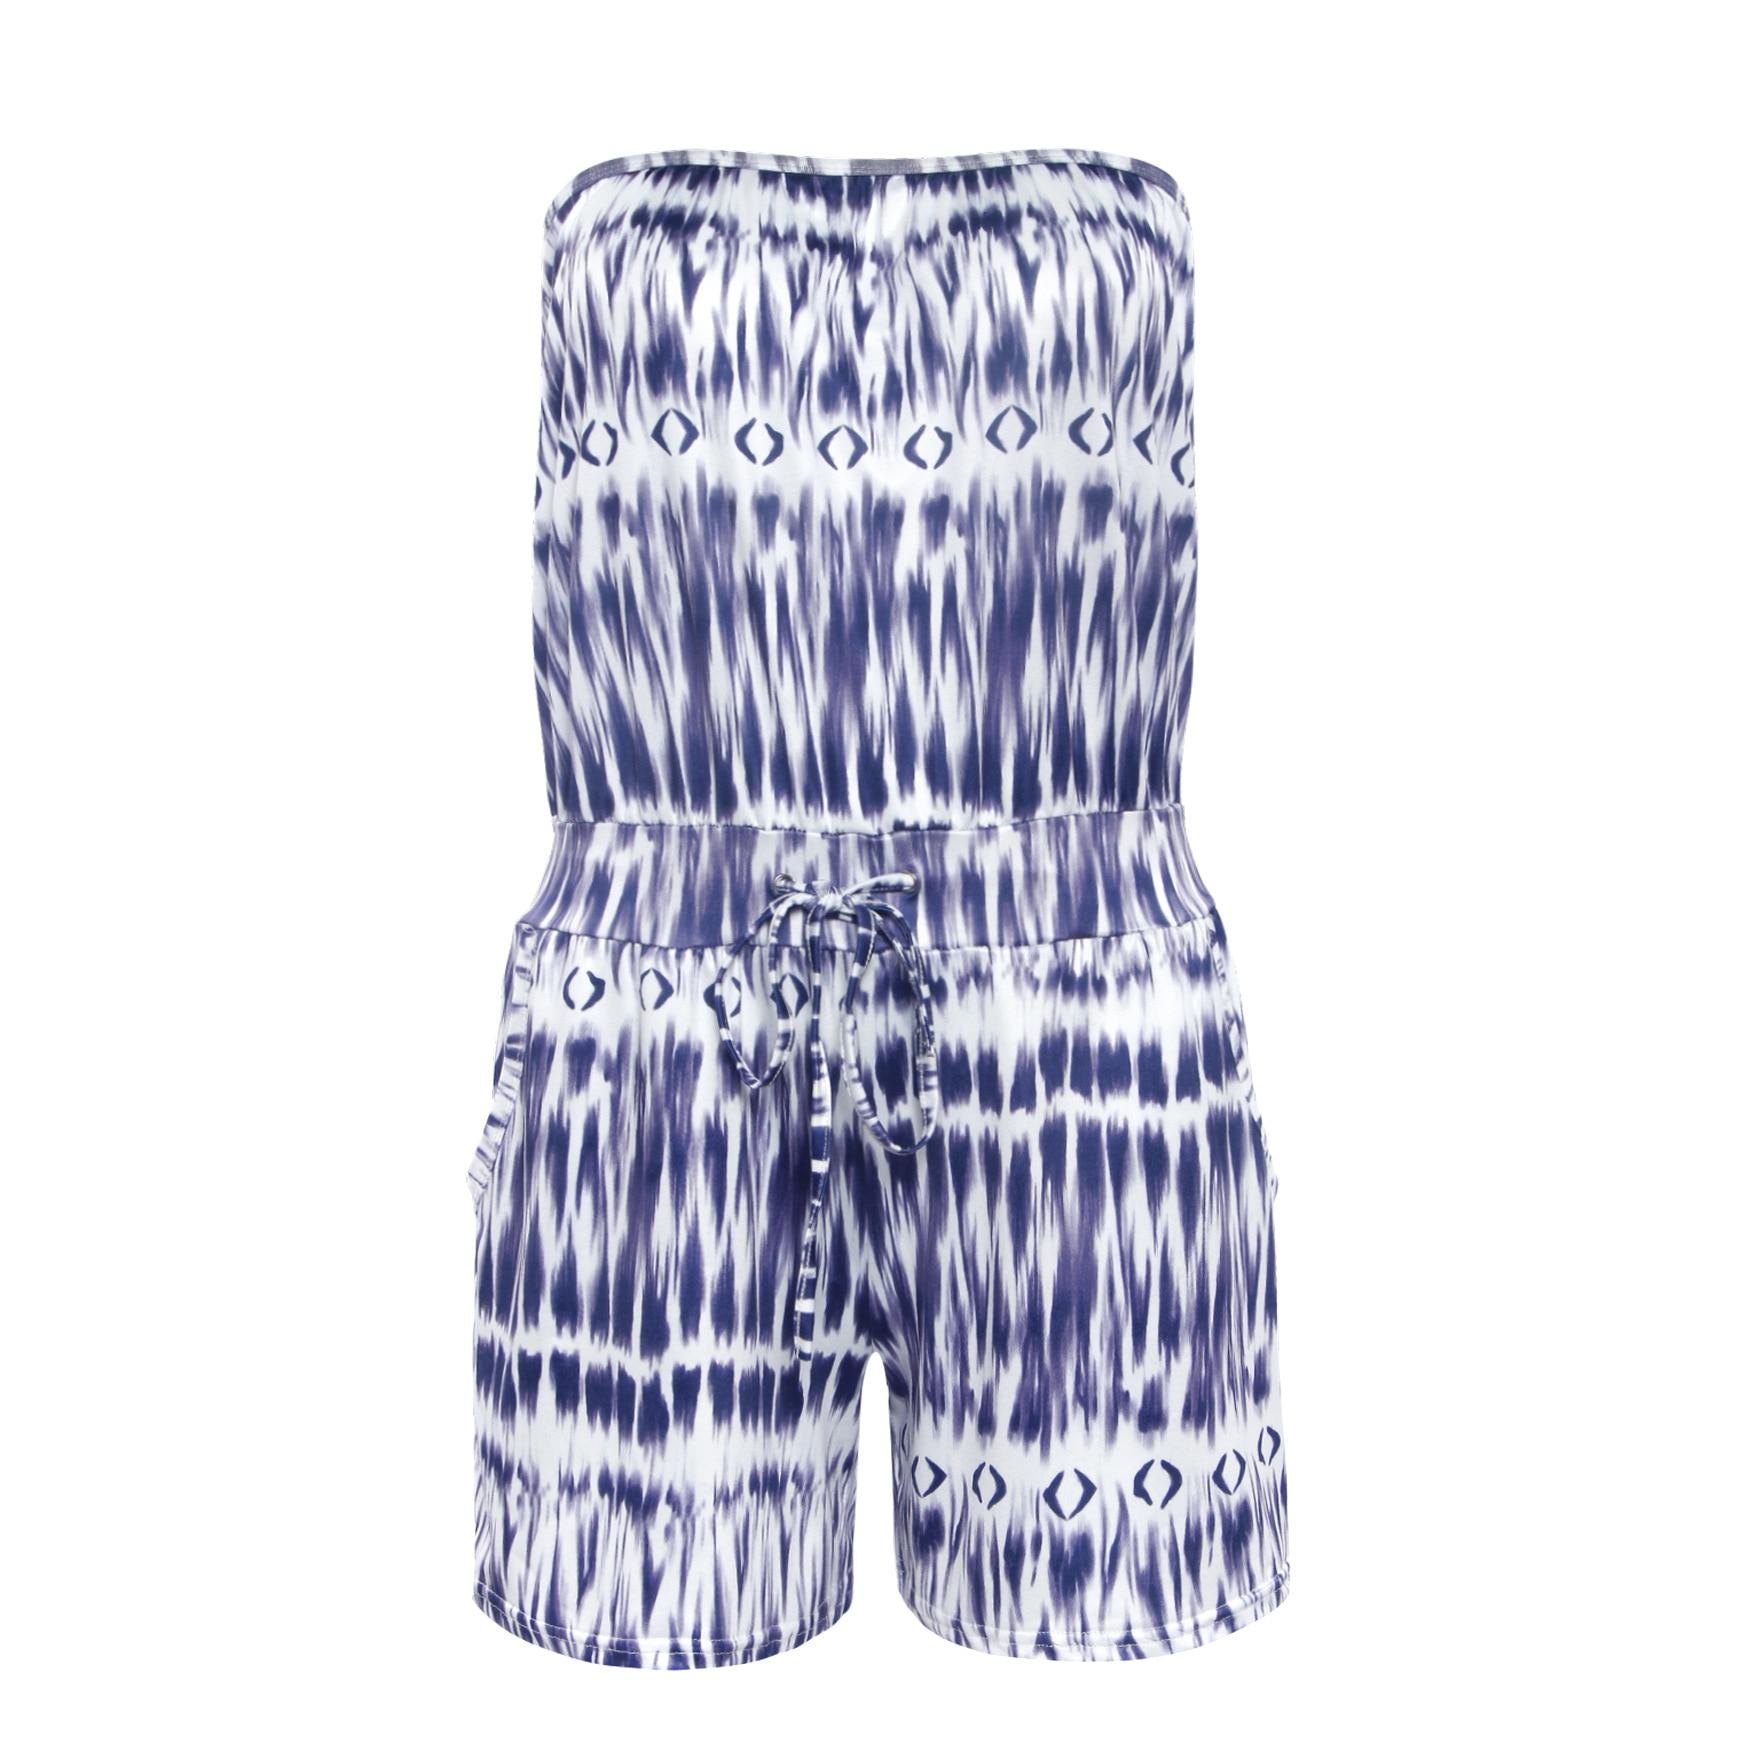 2018 New Summer Playsuit Women Kimono Chiffon Boho Floral Playsuit Print Ruffles All-match Lady Sexy Beach Girls Playsuit